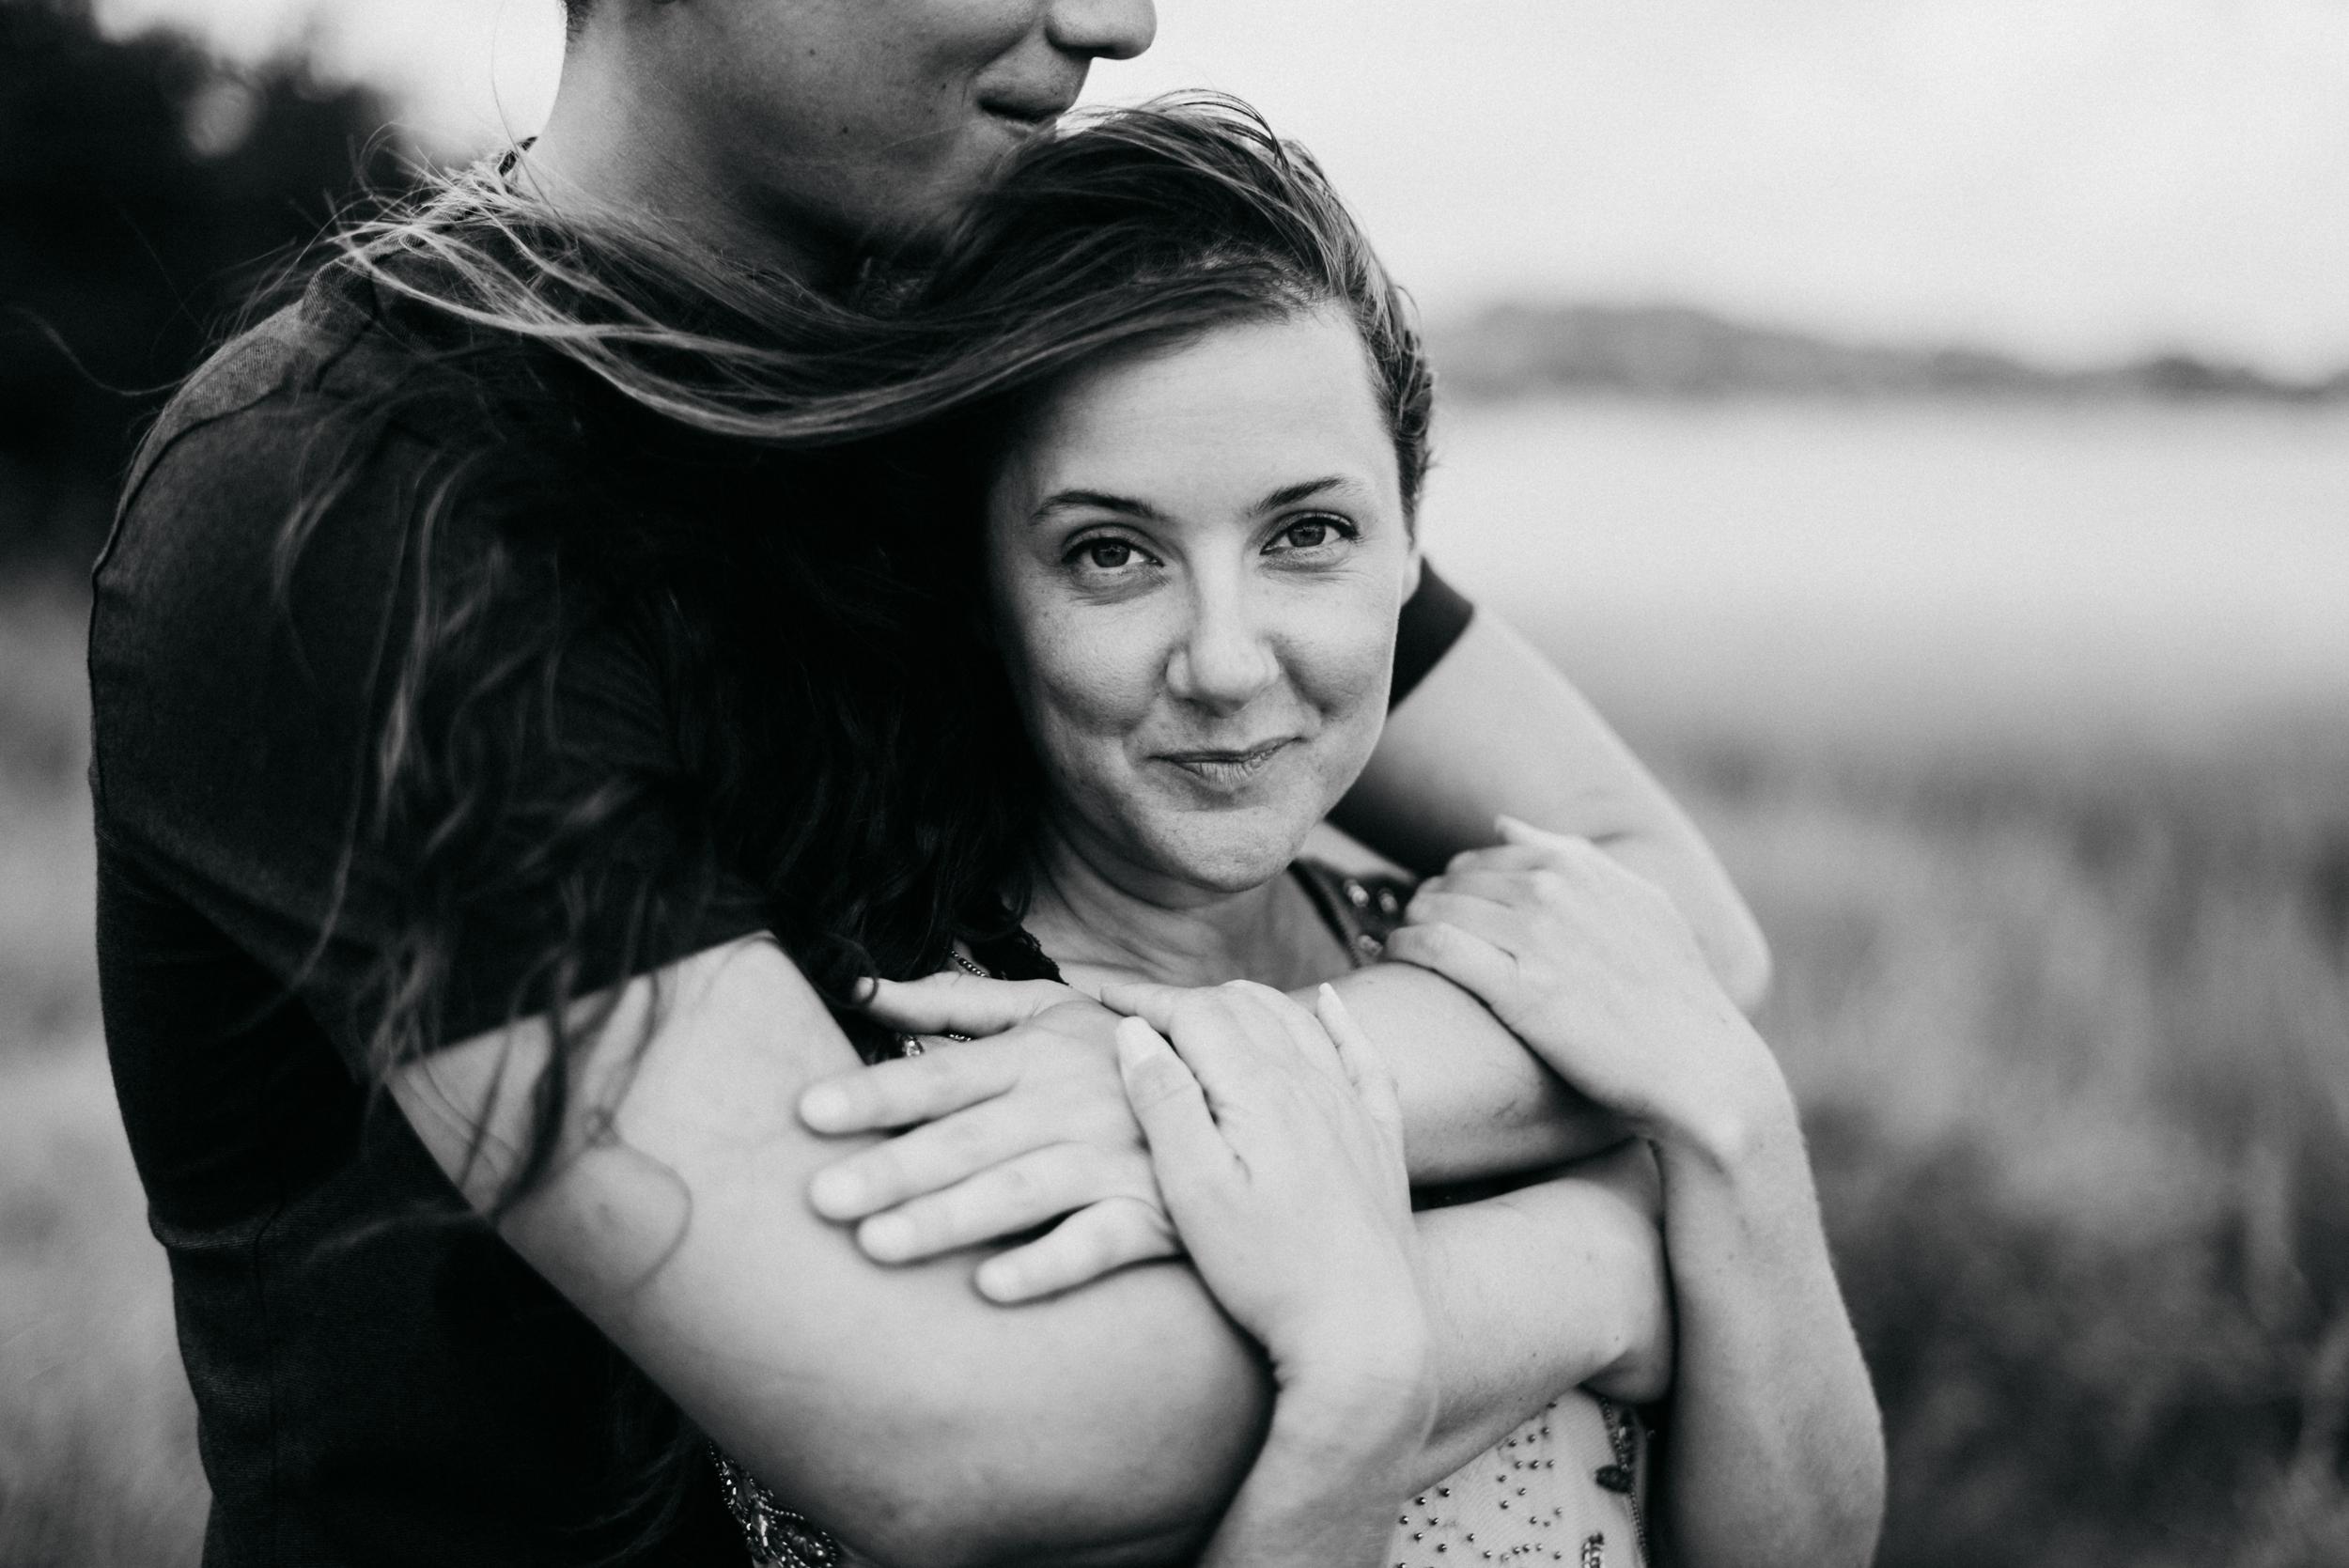 desiree-gardner-photography-pairs-france-monet-garden-monets-couple-wedding-engagement-giverny-30-a-30a-florida_0056.jpg